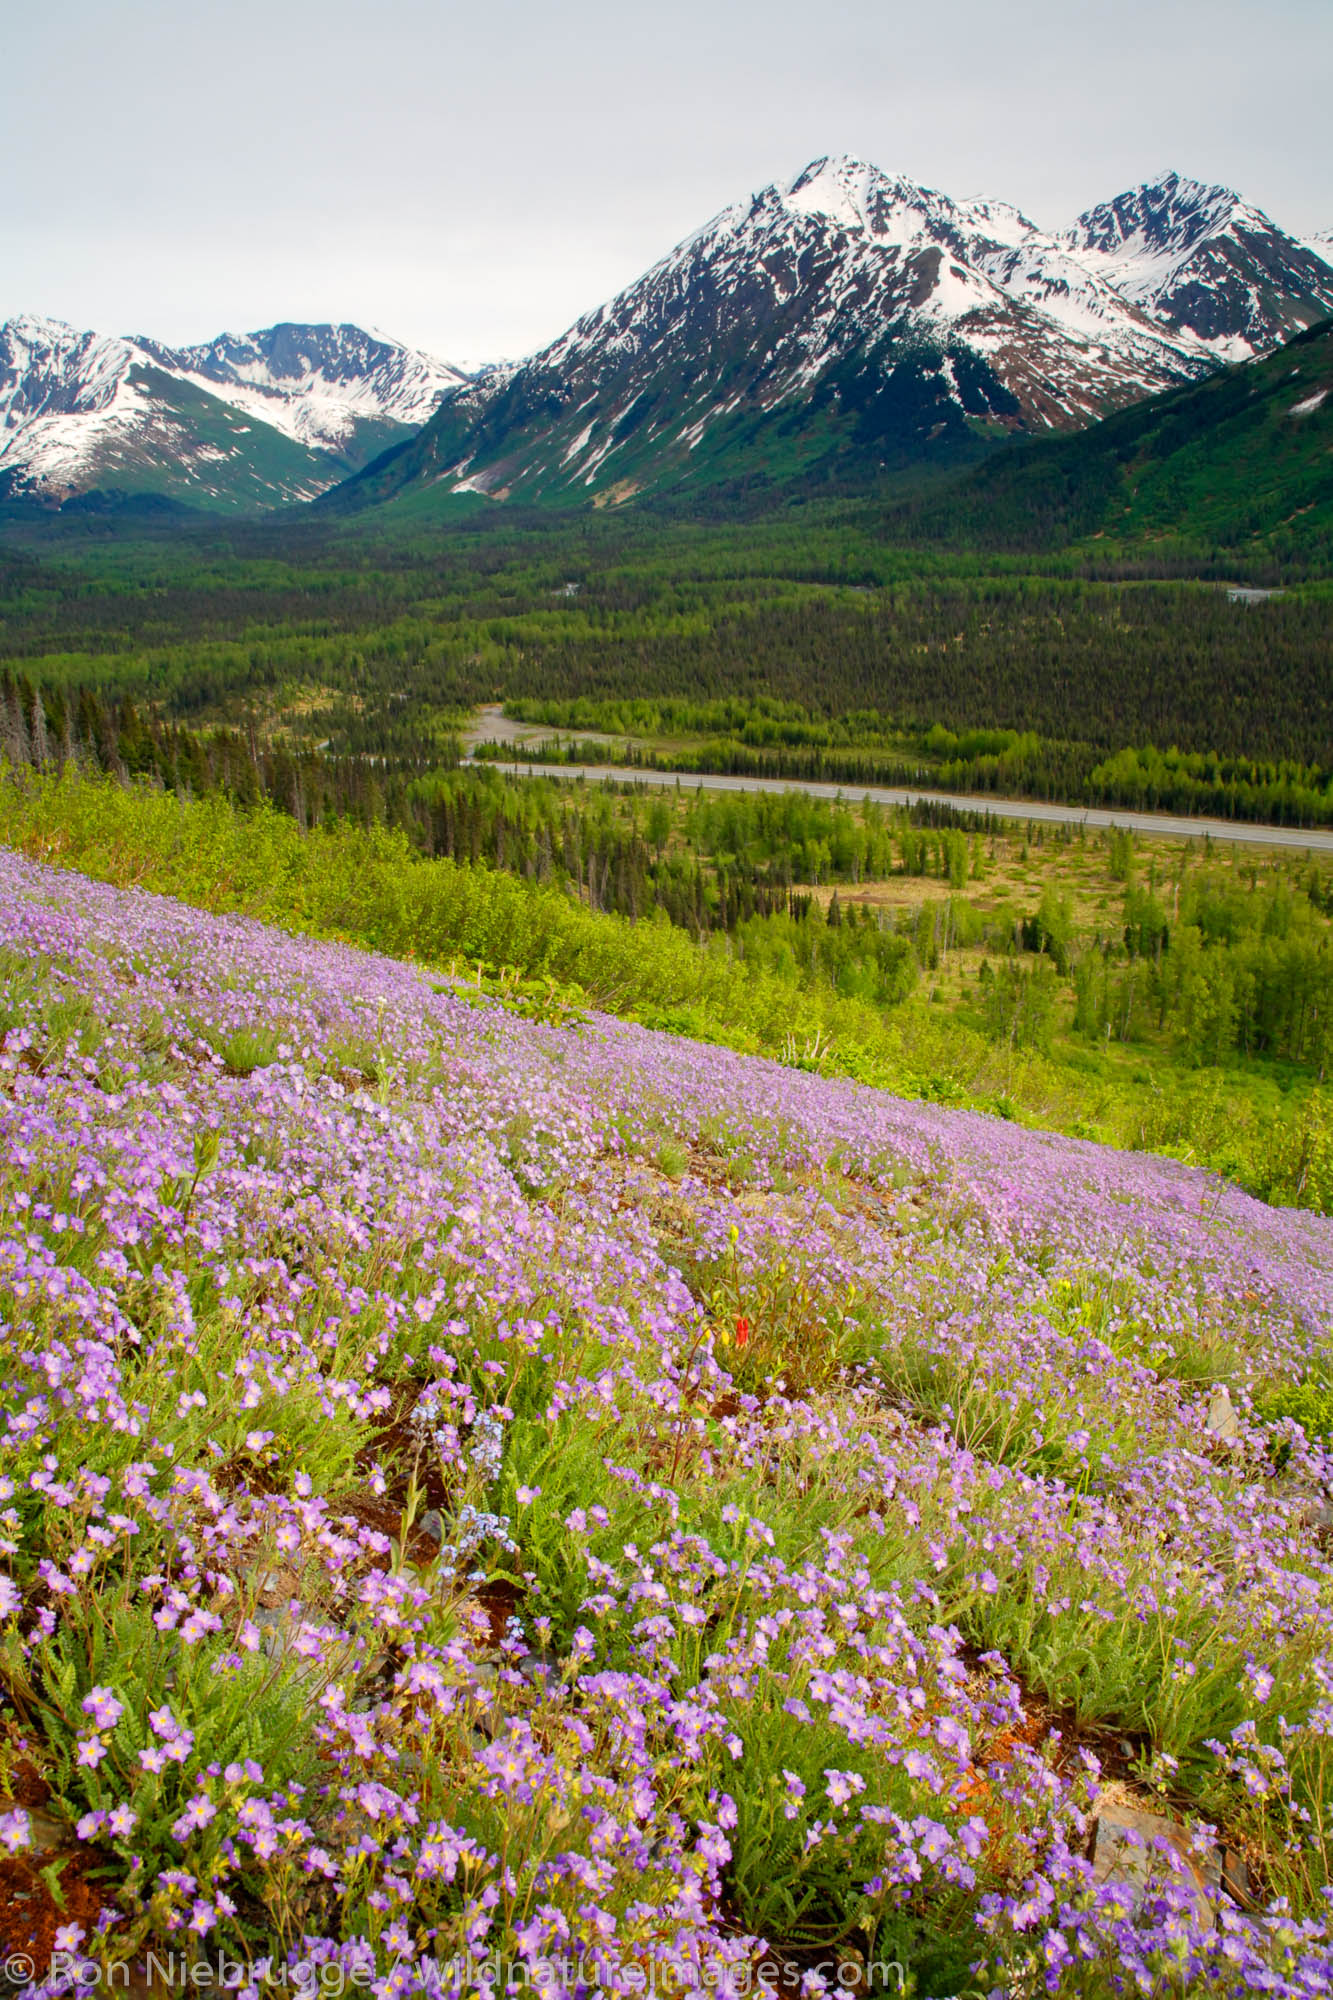 Wildflowers bloom along the Seward Highway, Kenai Peninsula, Chugach National Forest, Alaska.